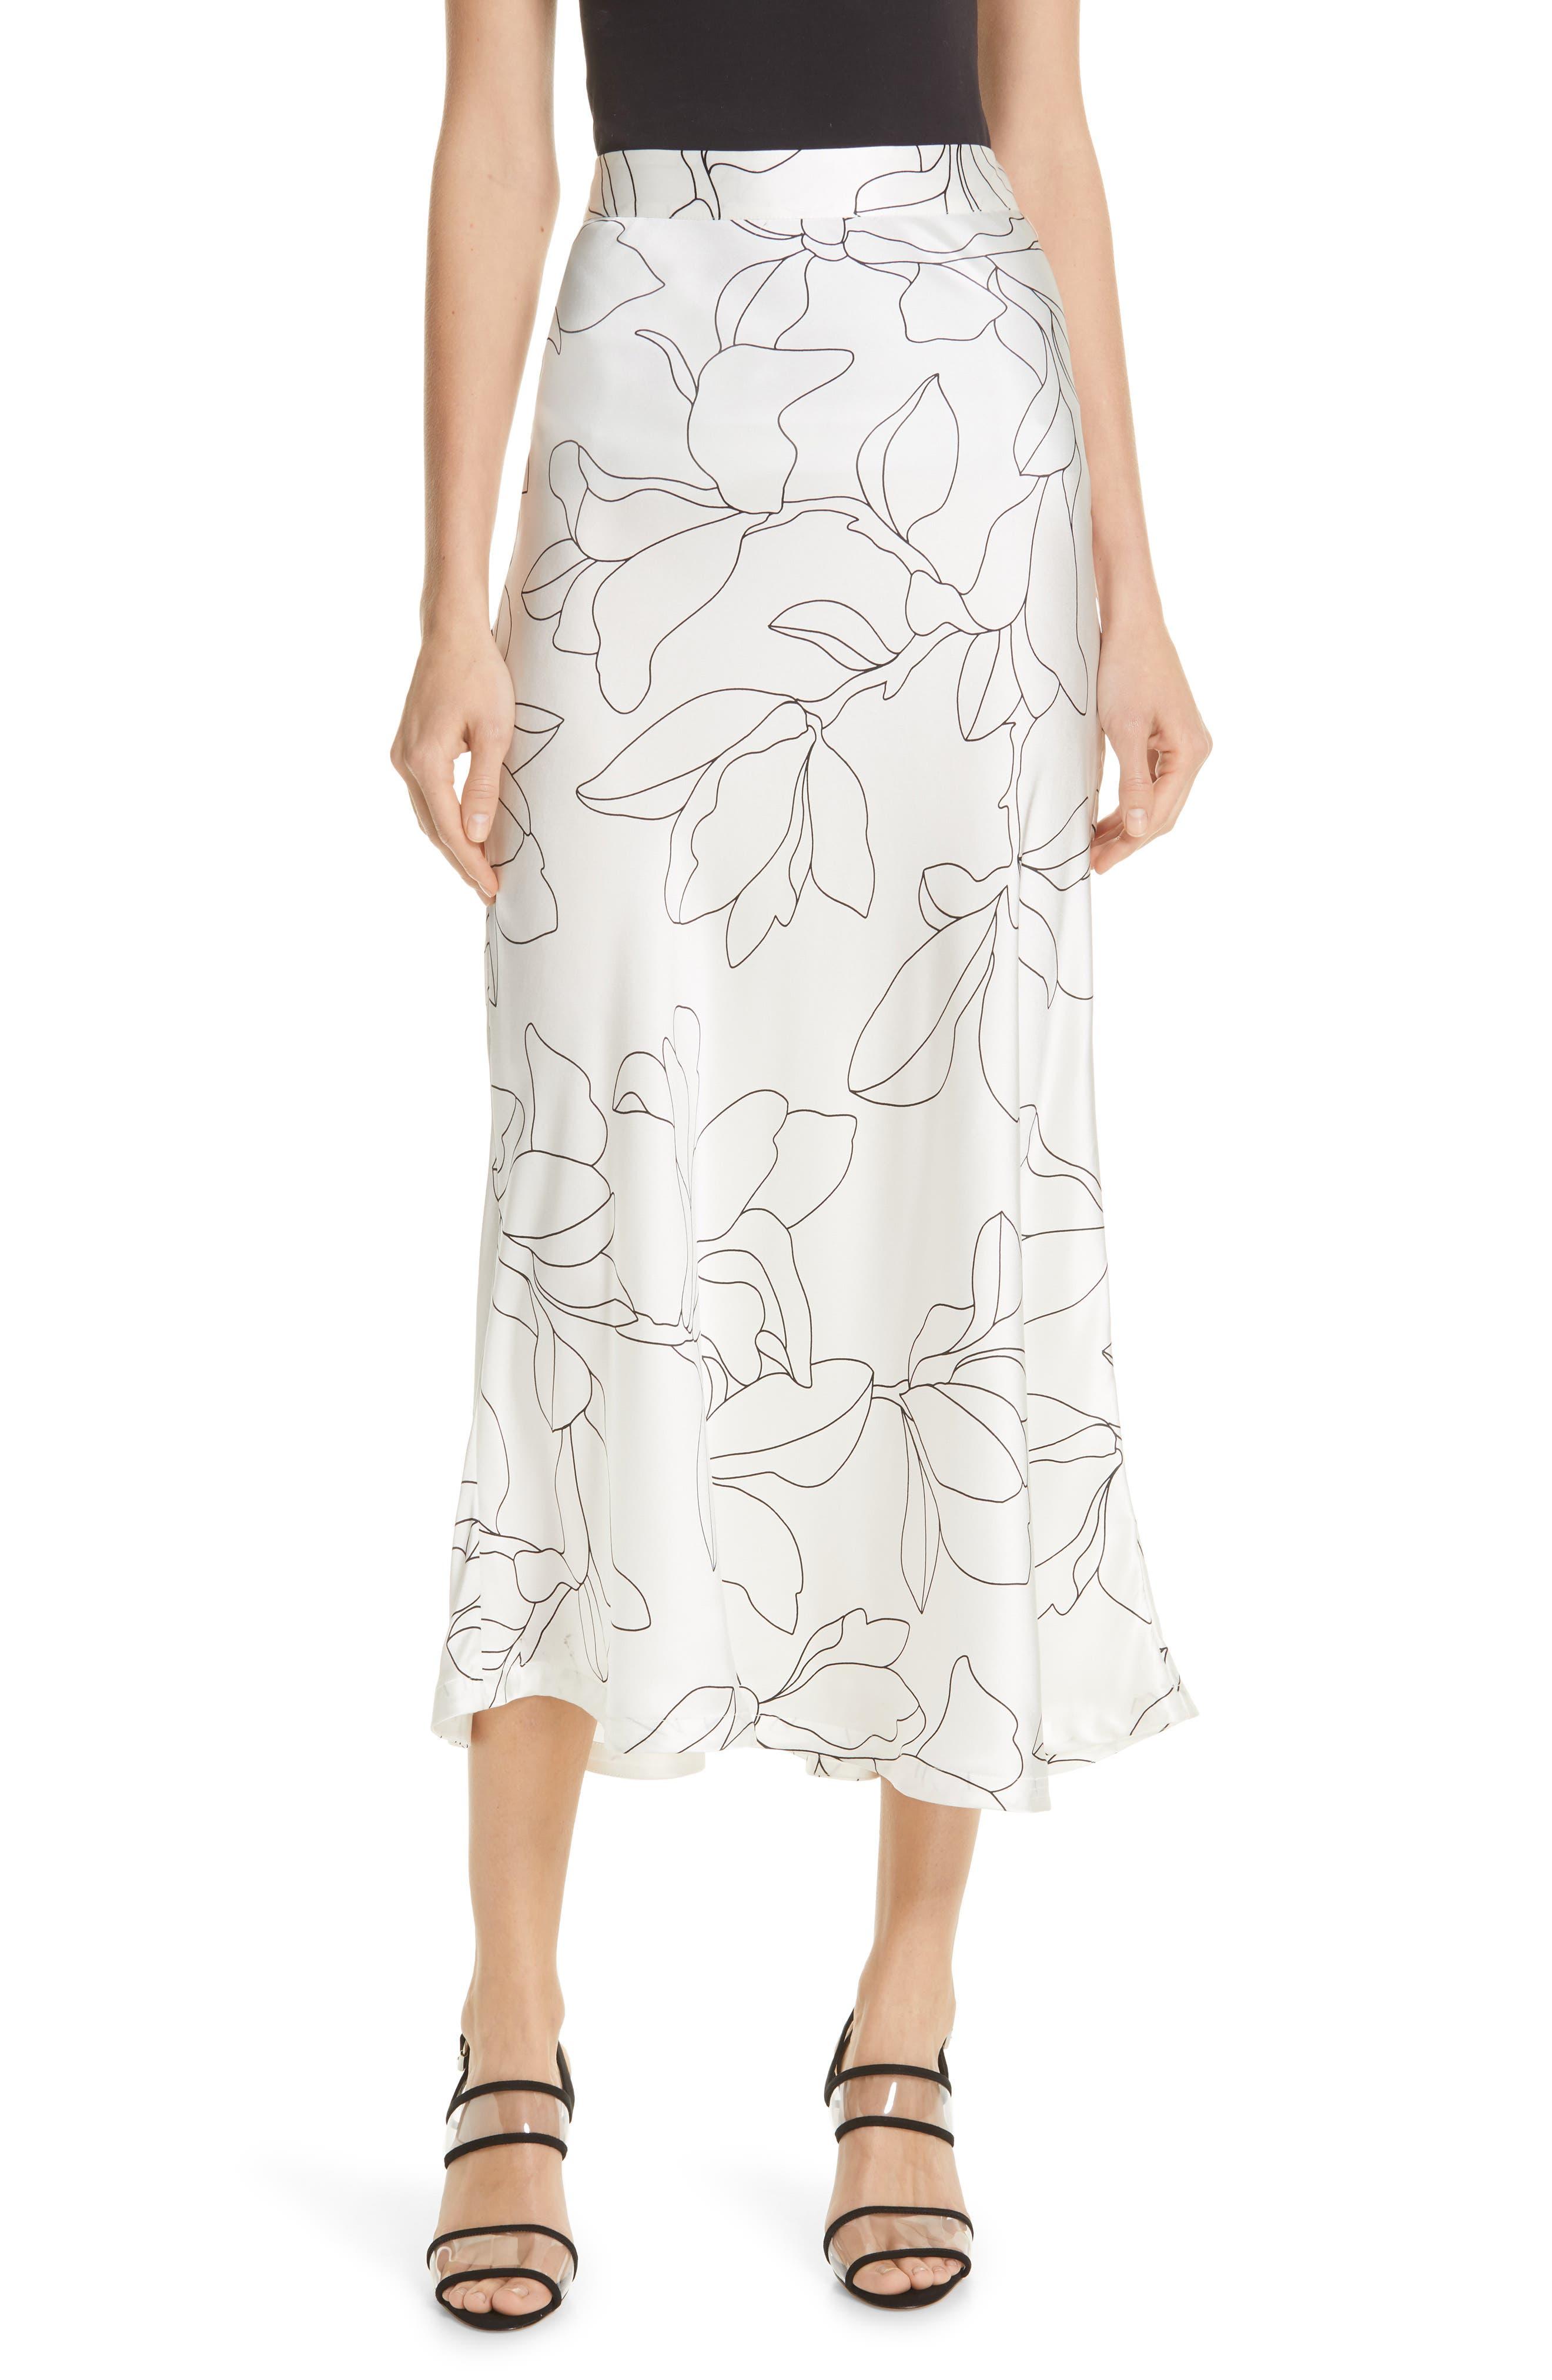 Iva Floral Silk Midi Skirt,                             Main thumbnail 1, color,                             NATURAL WHITE TRUE BLACK